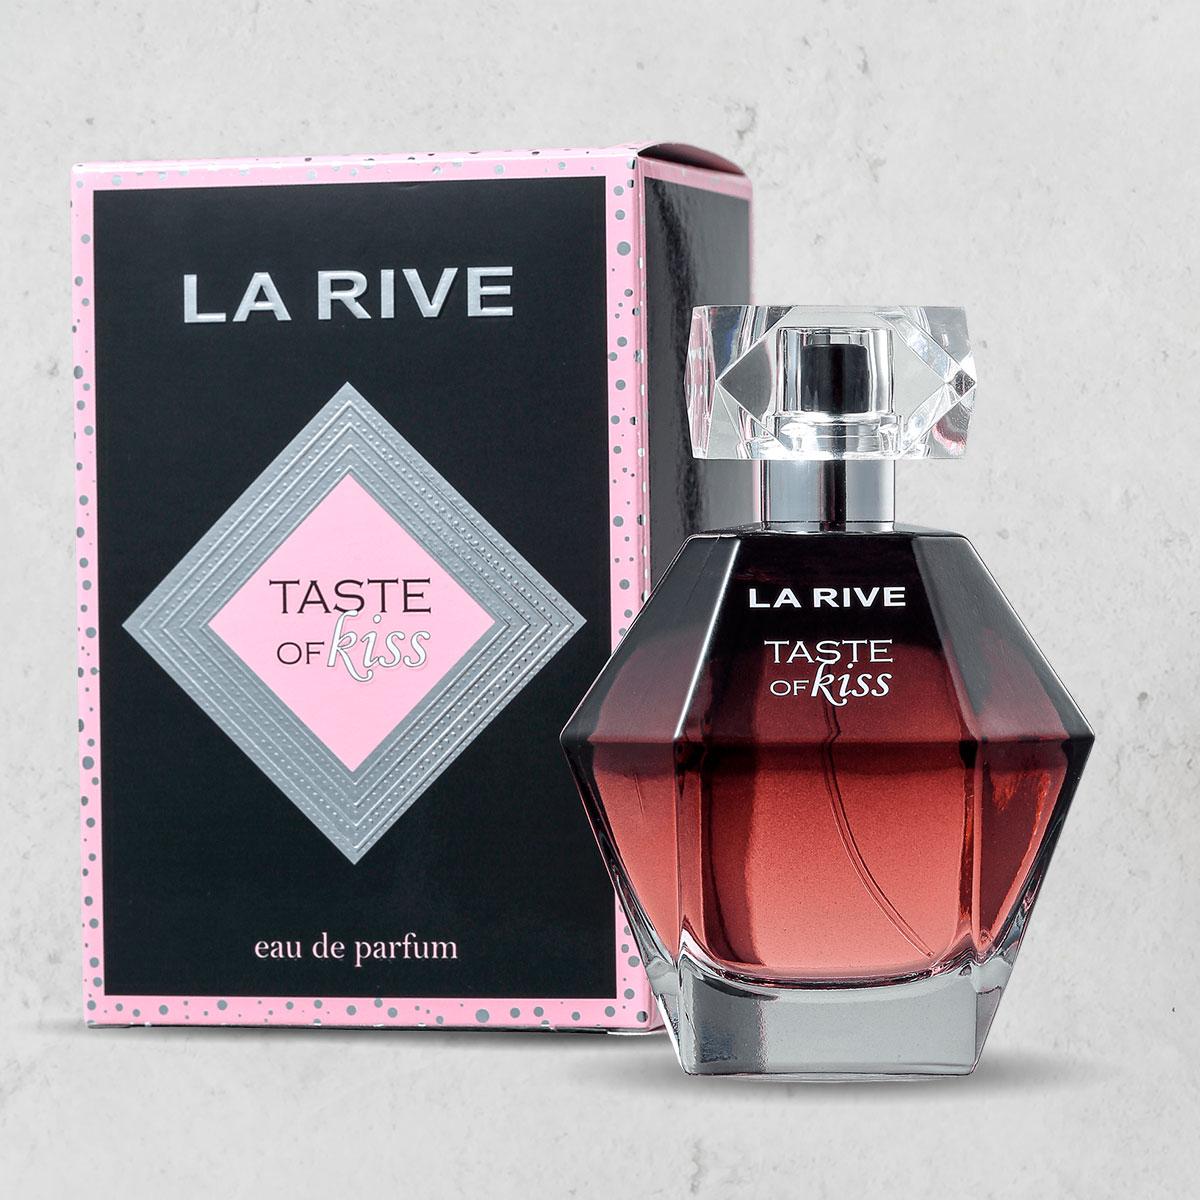 Perfume Taste Of Kiss Feminino Edp 100ml  La Rive